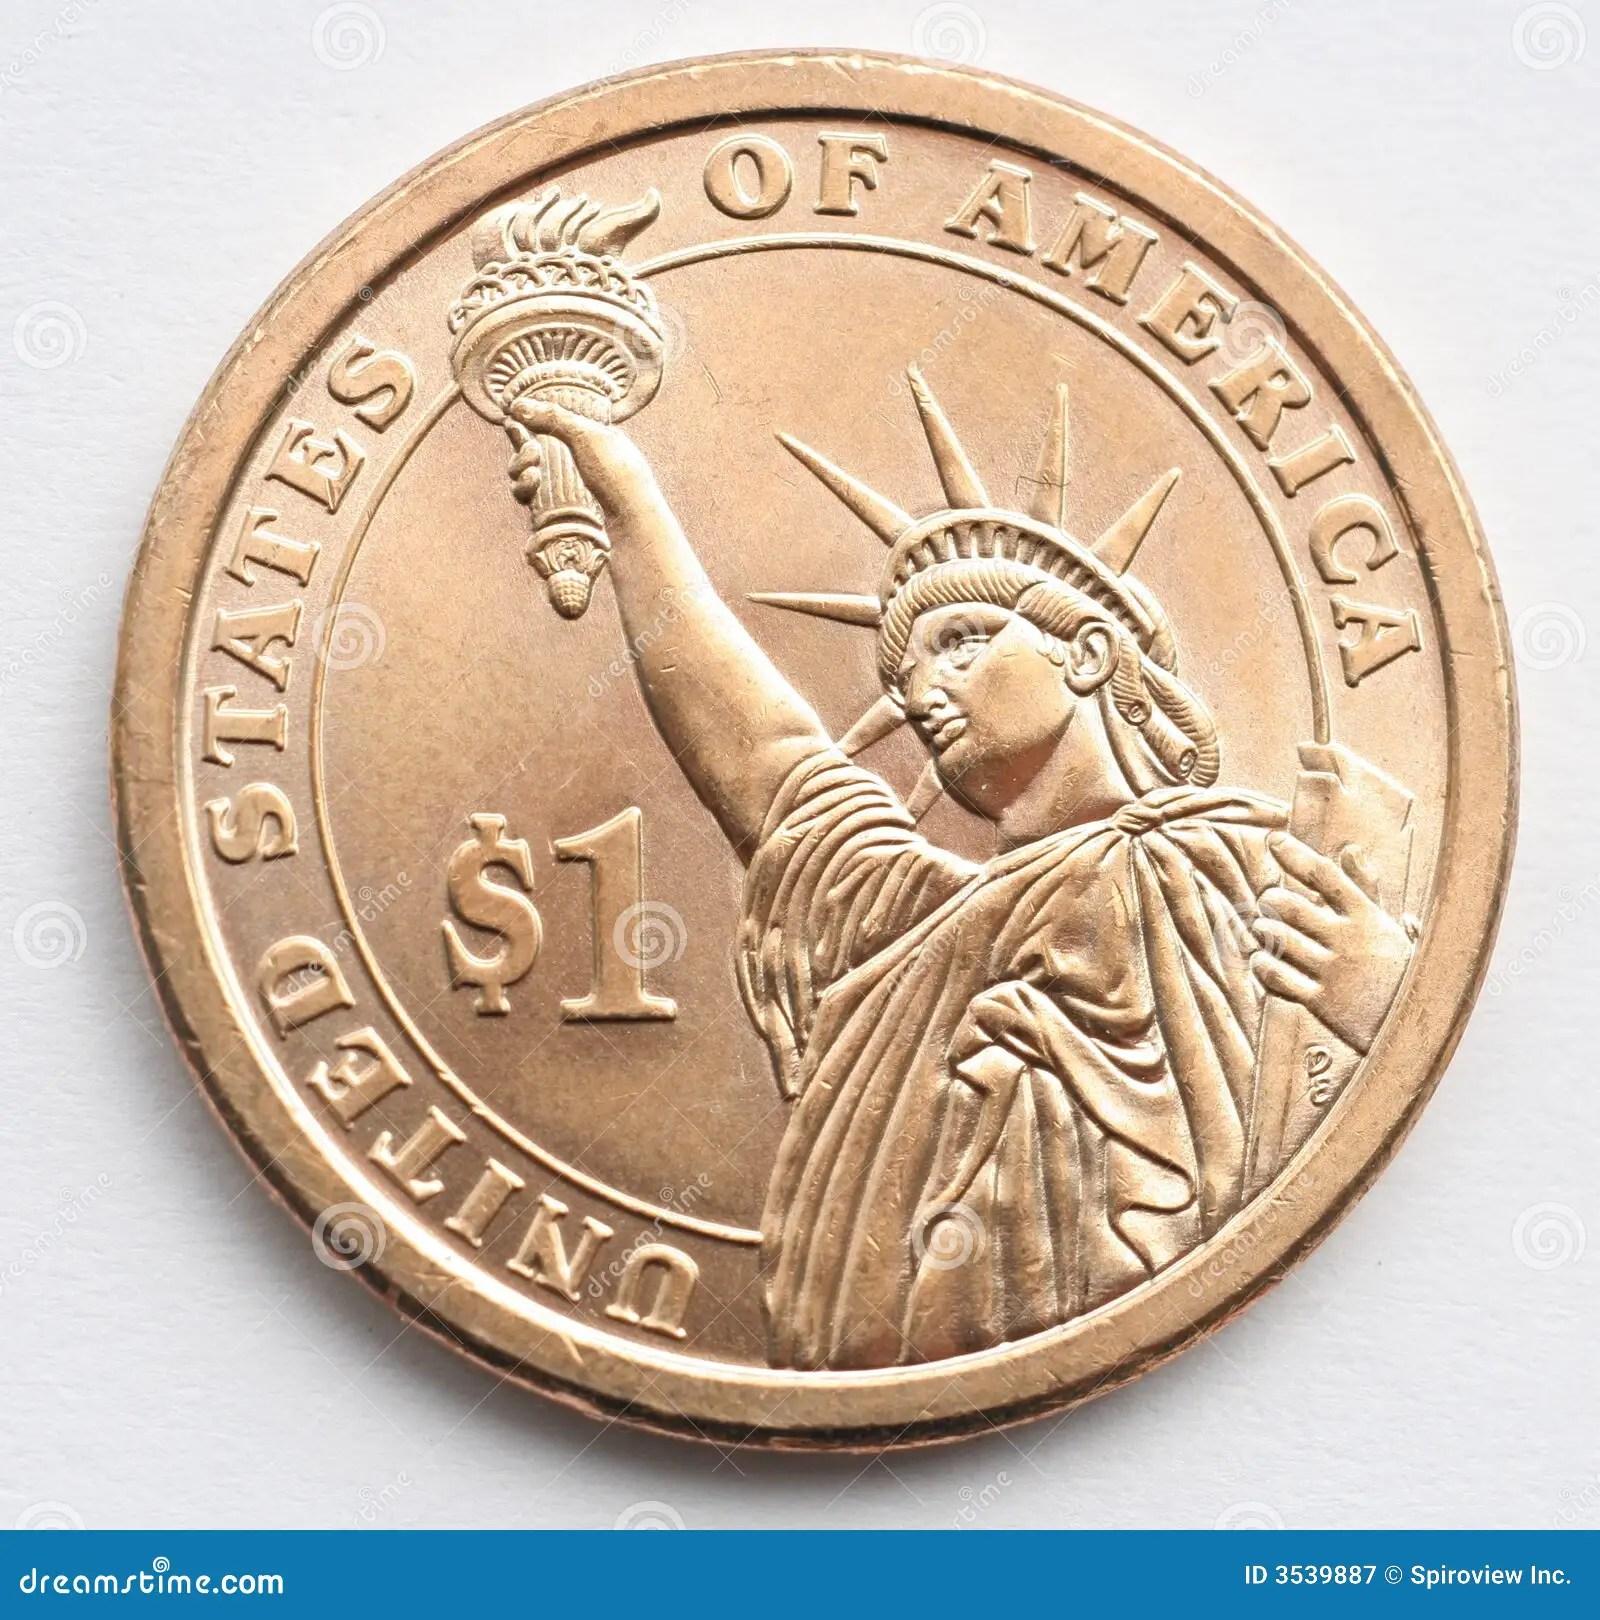 Worksheet United States Coins